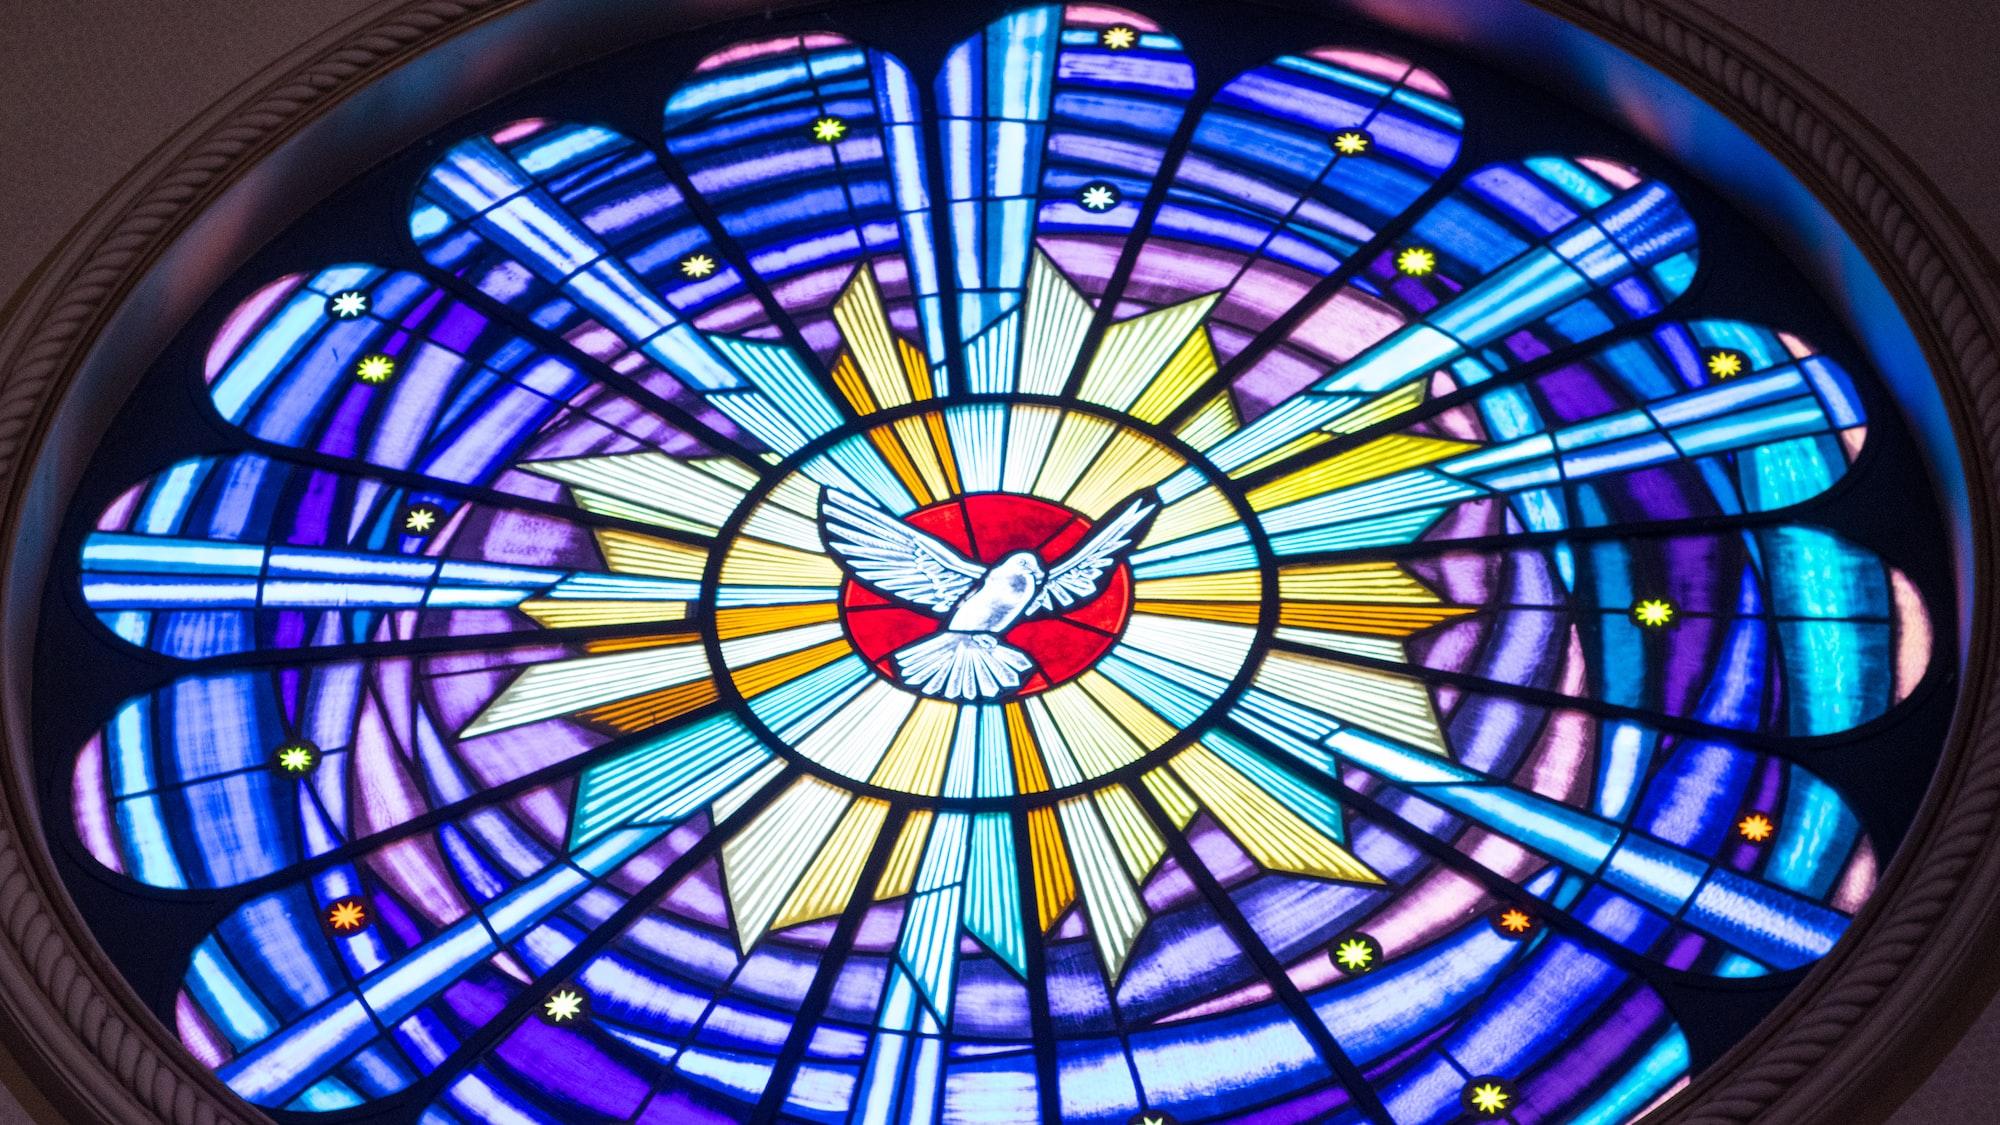 Church Service, Trinity Sunday